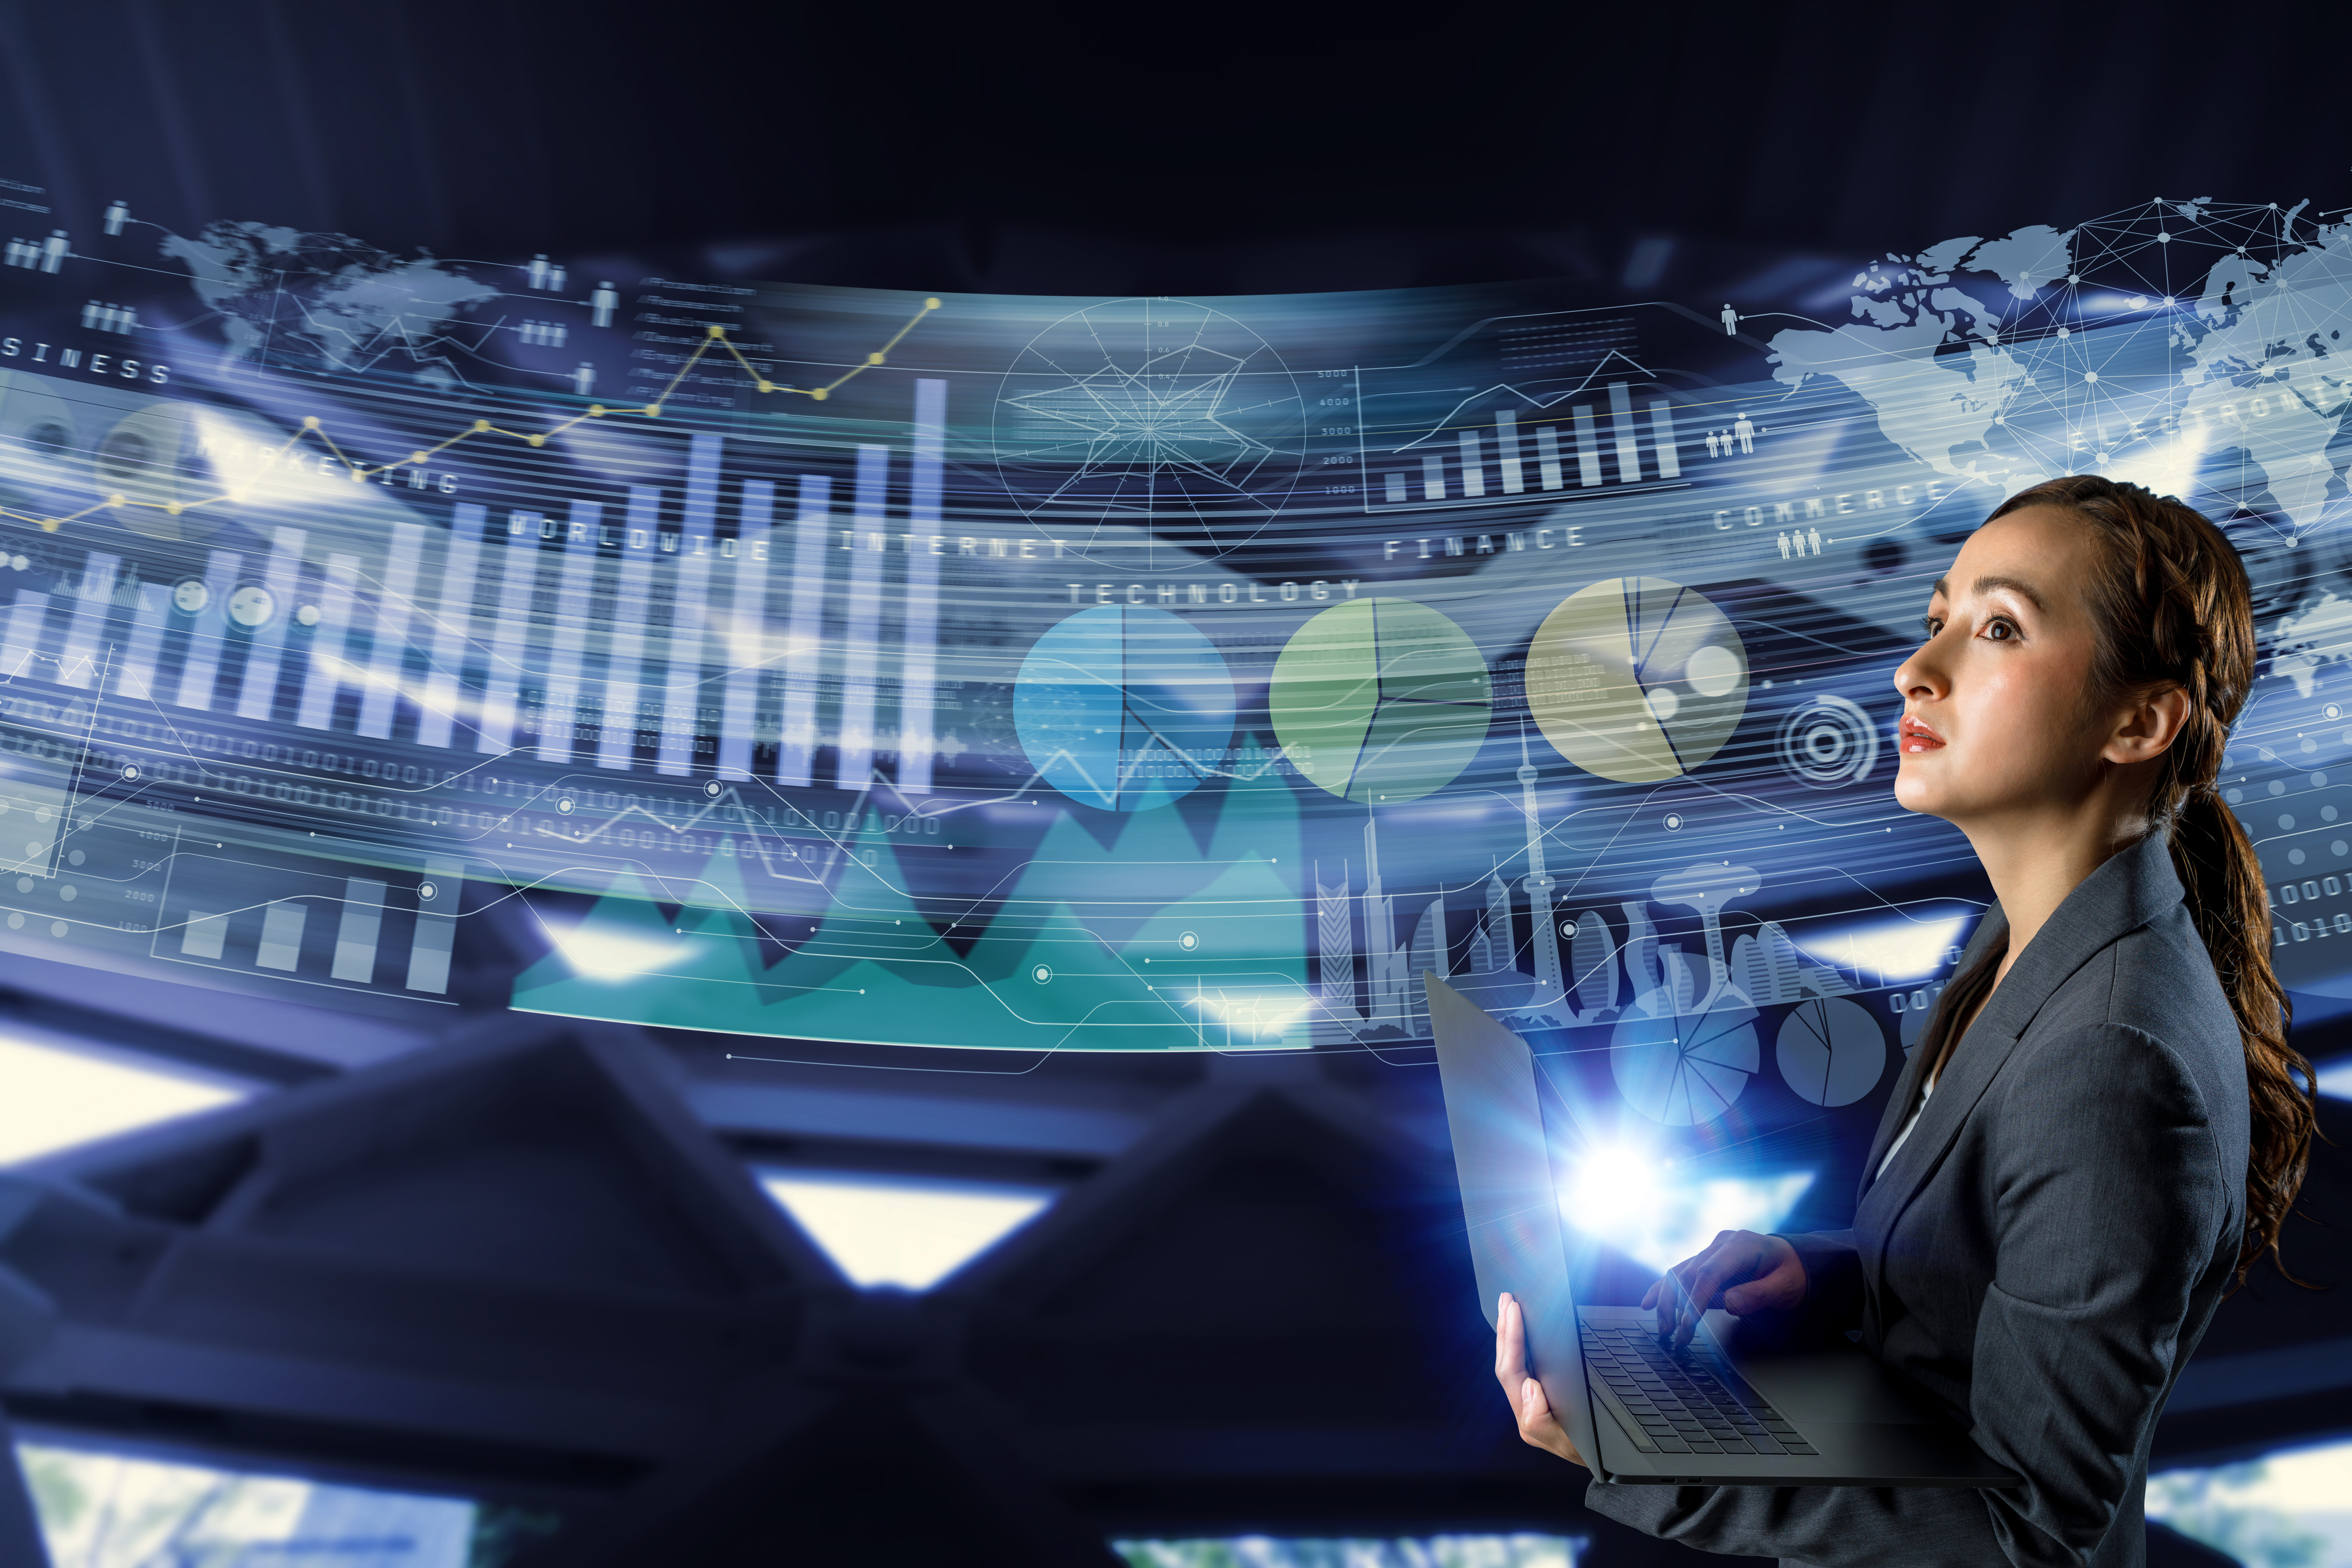 Main visual : DX survey reveals high levels of enterprise-consumer disconnect